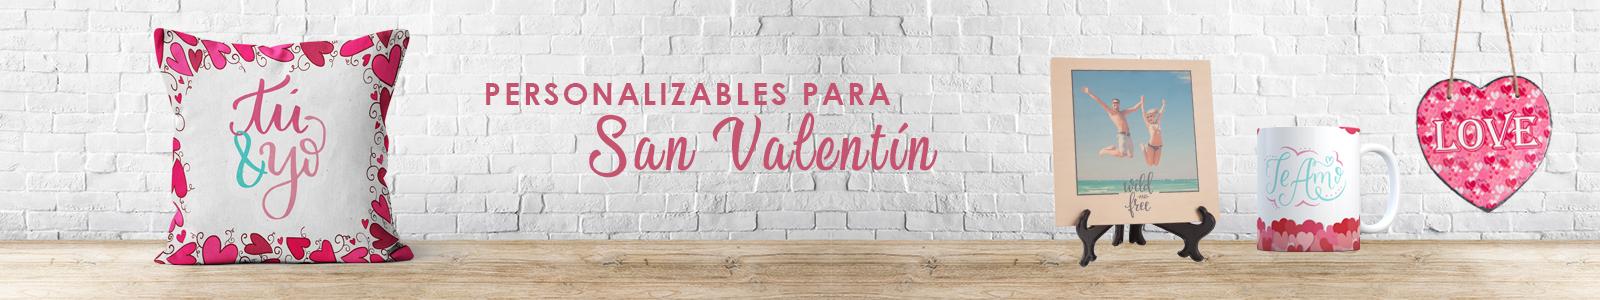 Personalizables para San Valentín